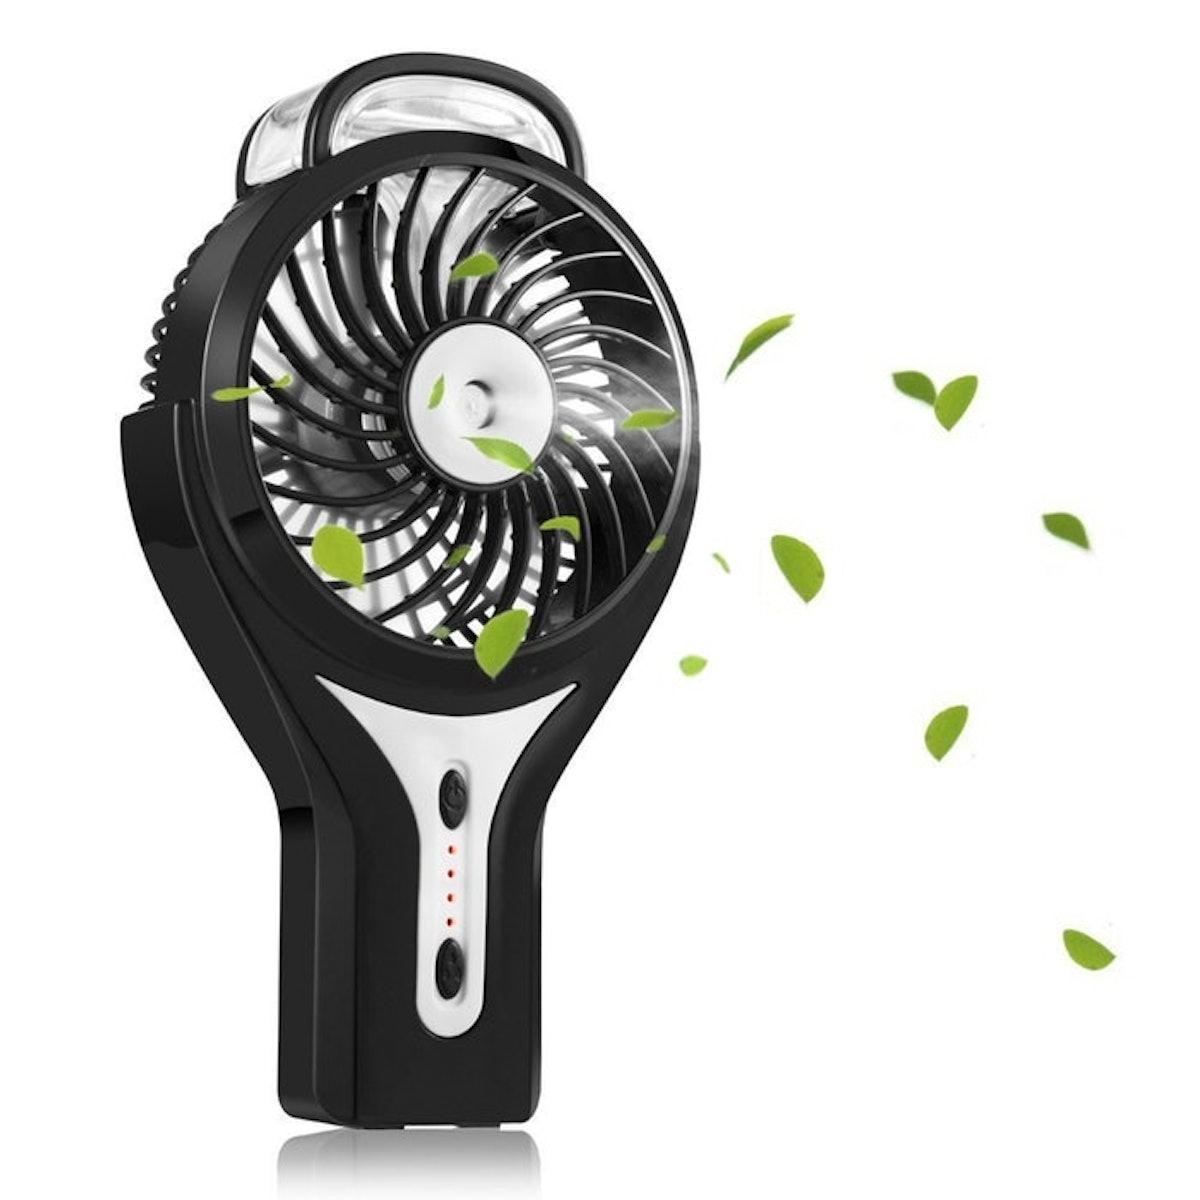 TianNorth Handheld Fan